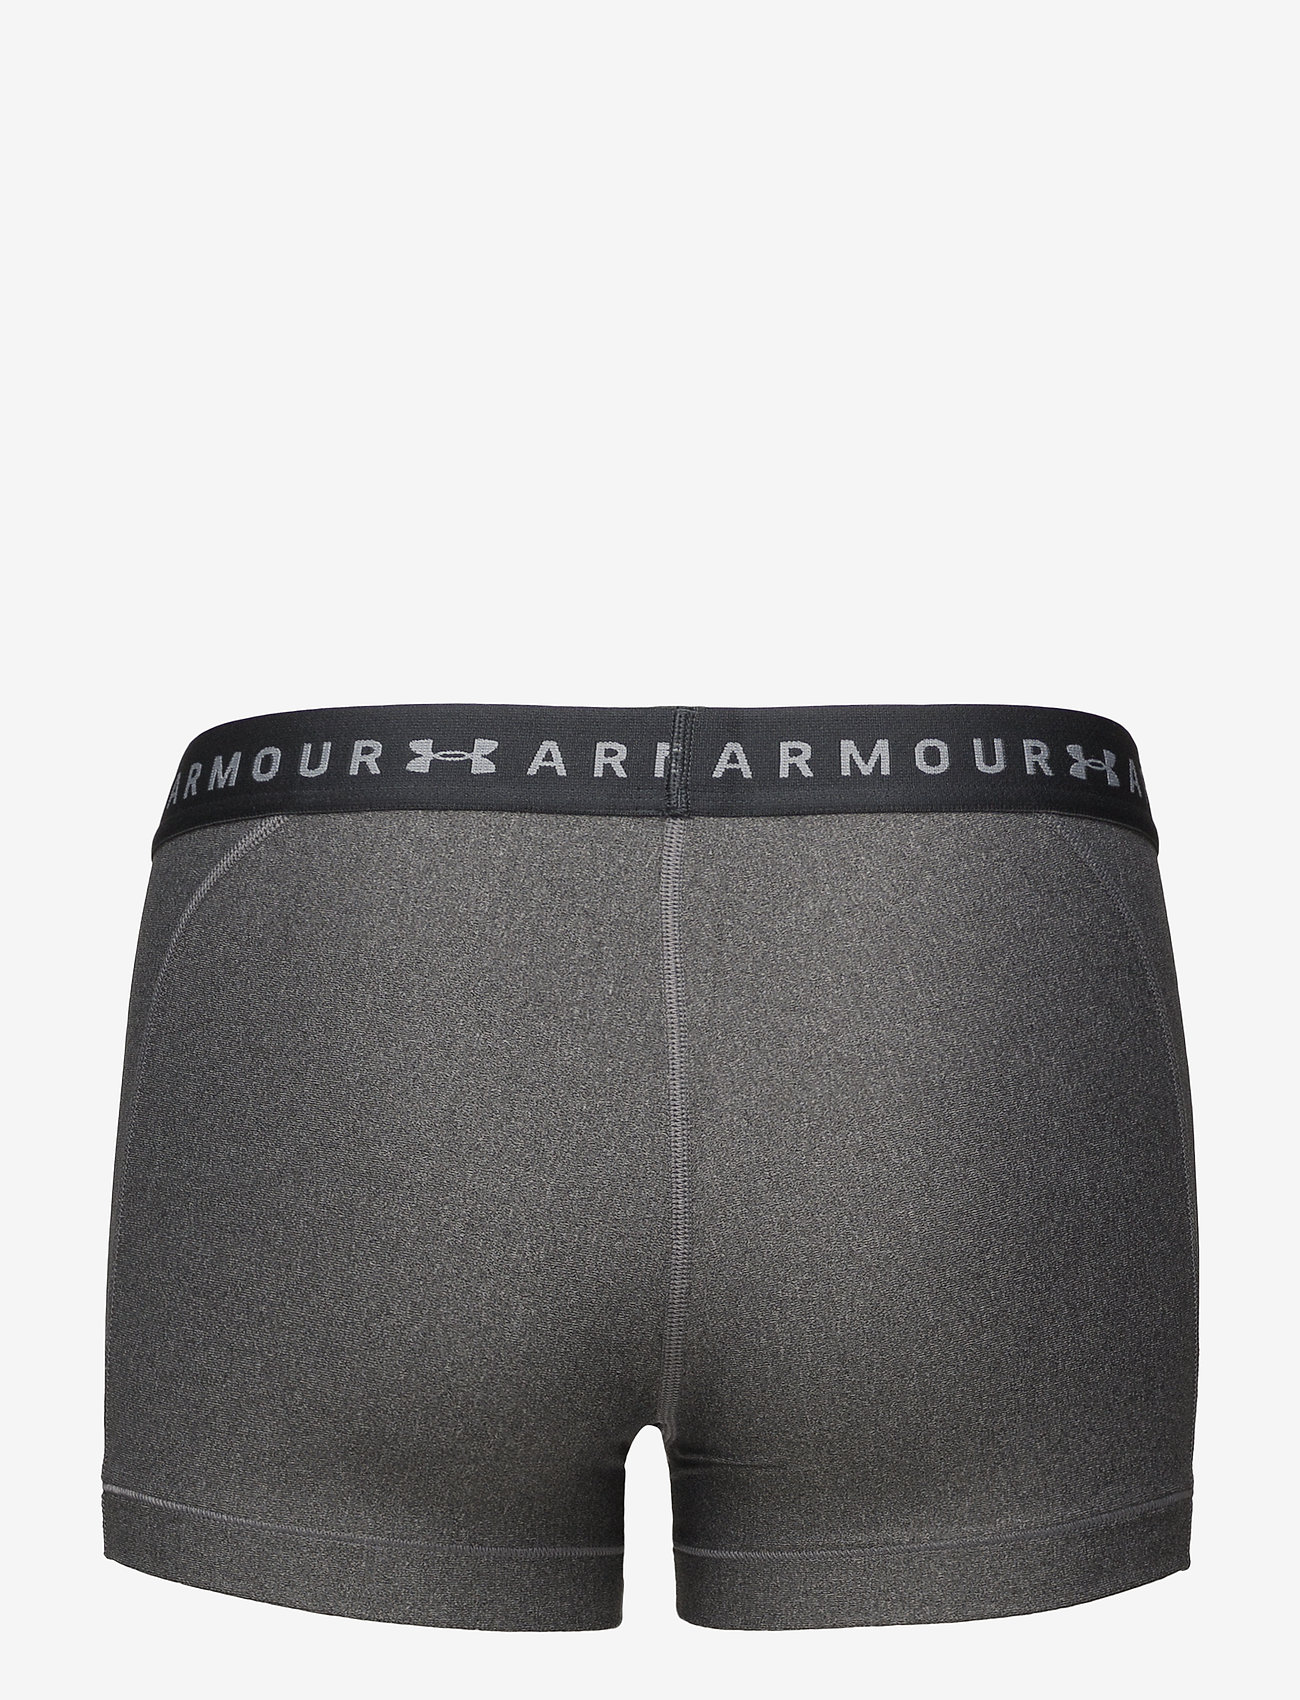 Under Armour - UA HG Armour Shorty - spodenki treningowe - charcoal light heather - 1